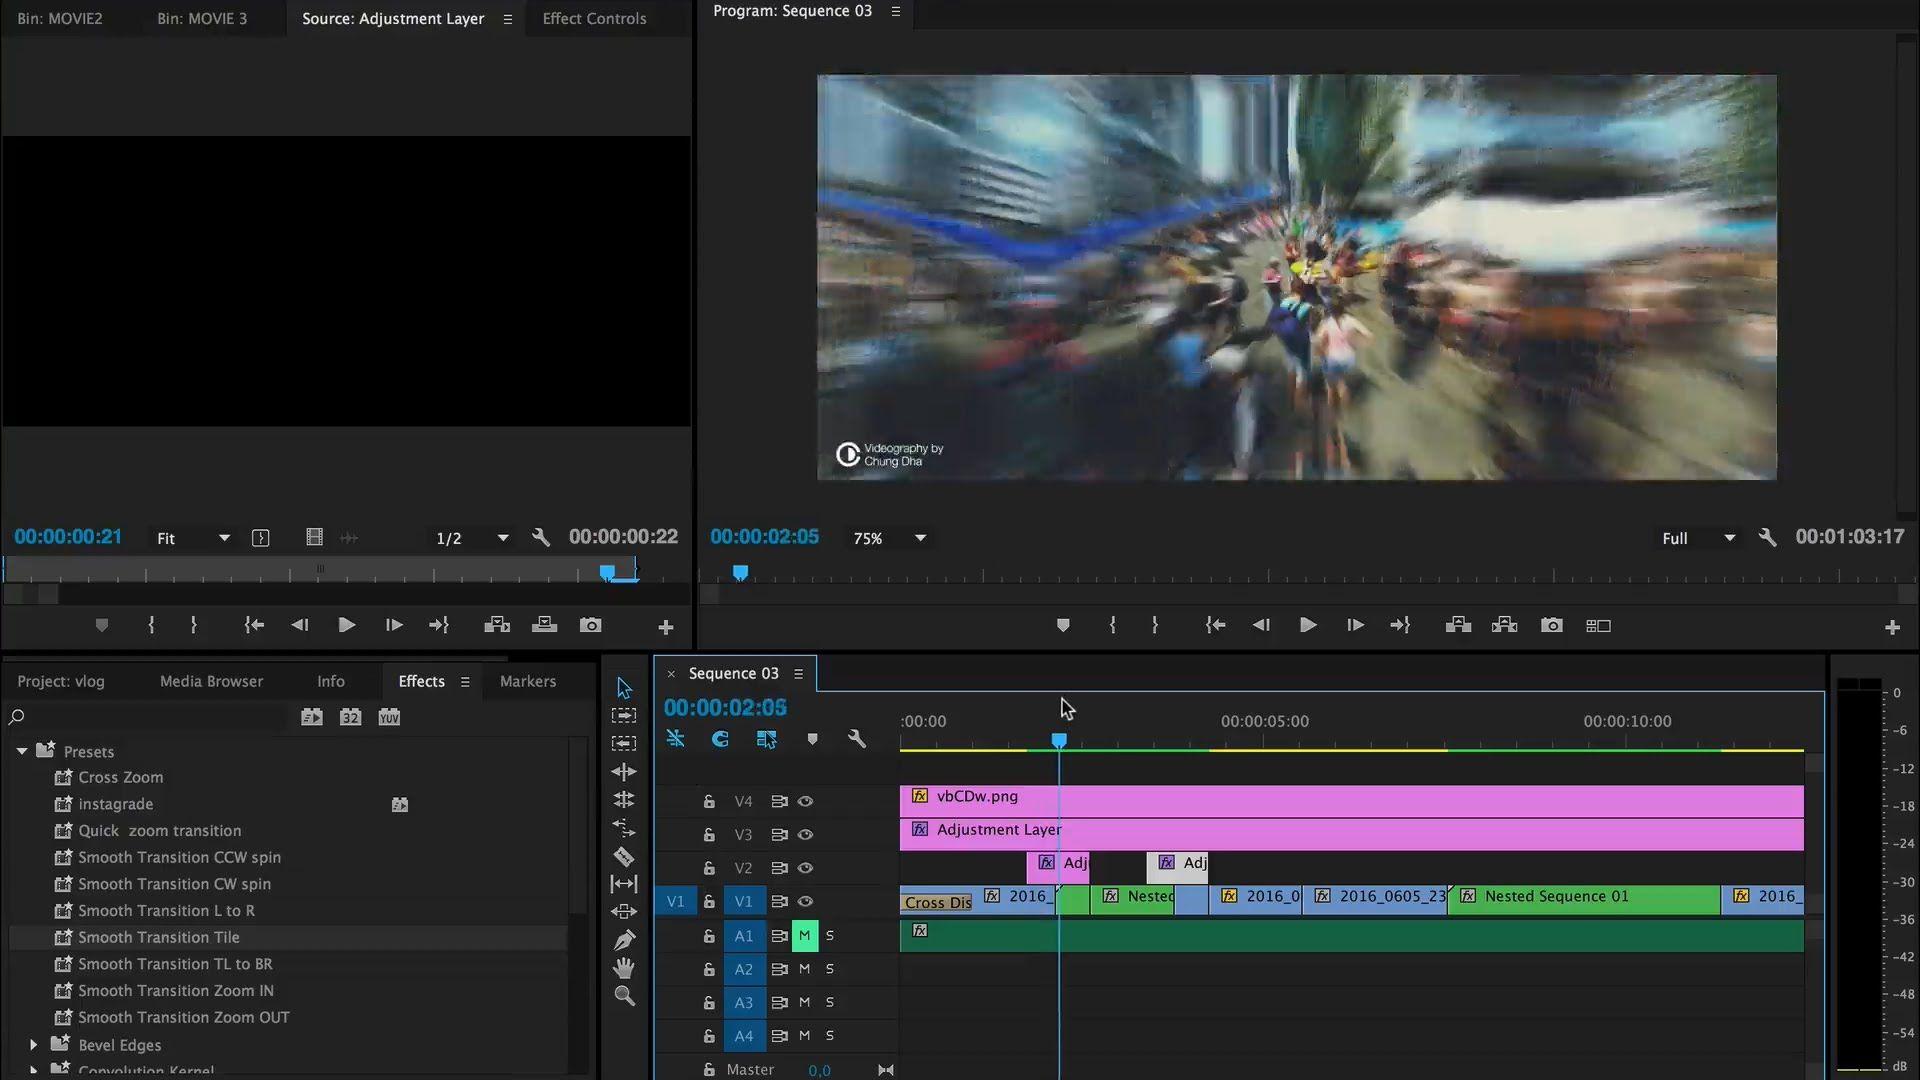 Skip to video section: 1:50 - Diagonal Pan Transition 4:00